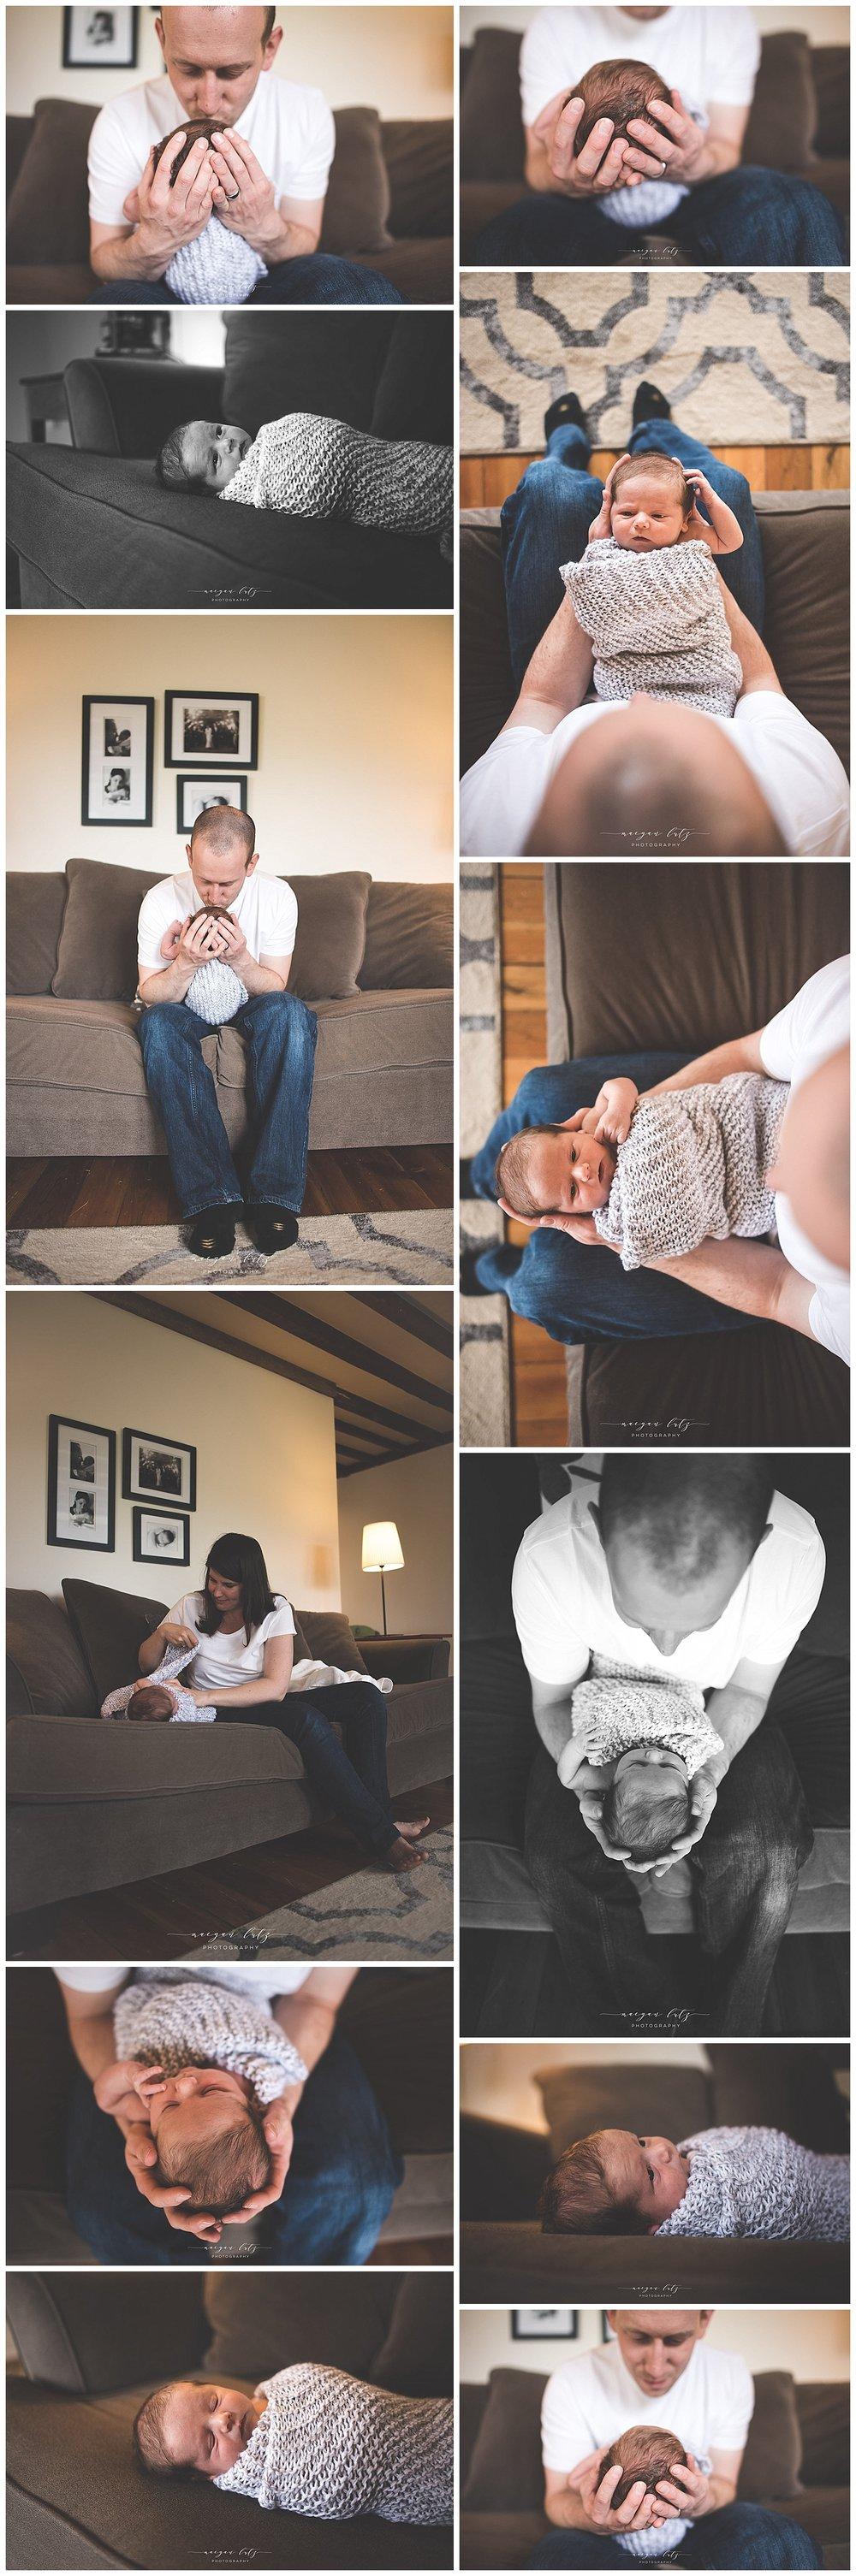 NEPA-Lifestyle-Newborn-Photographer-in-Wilkes Barre-PA_0023.jpg